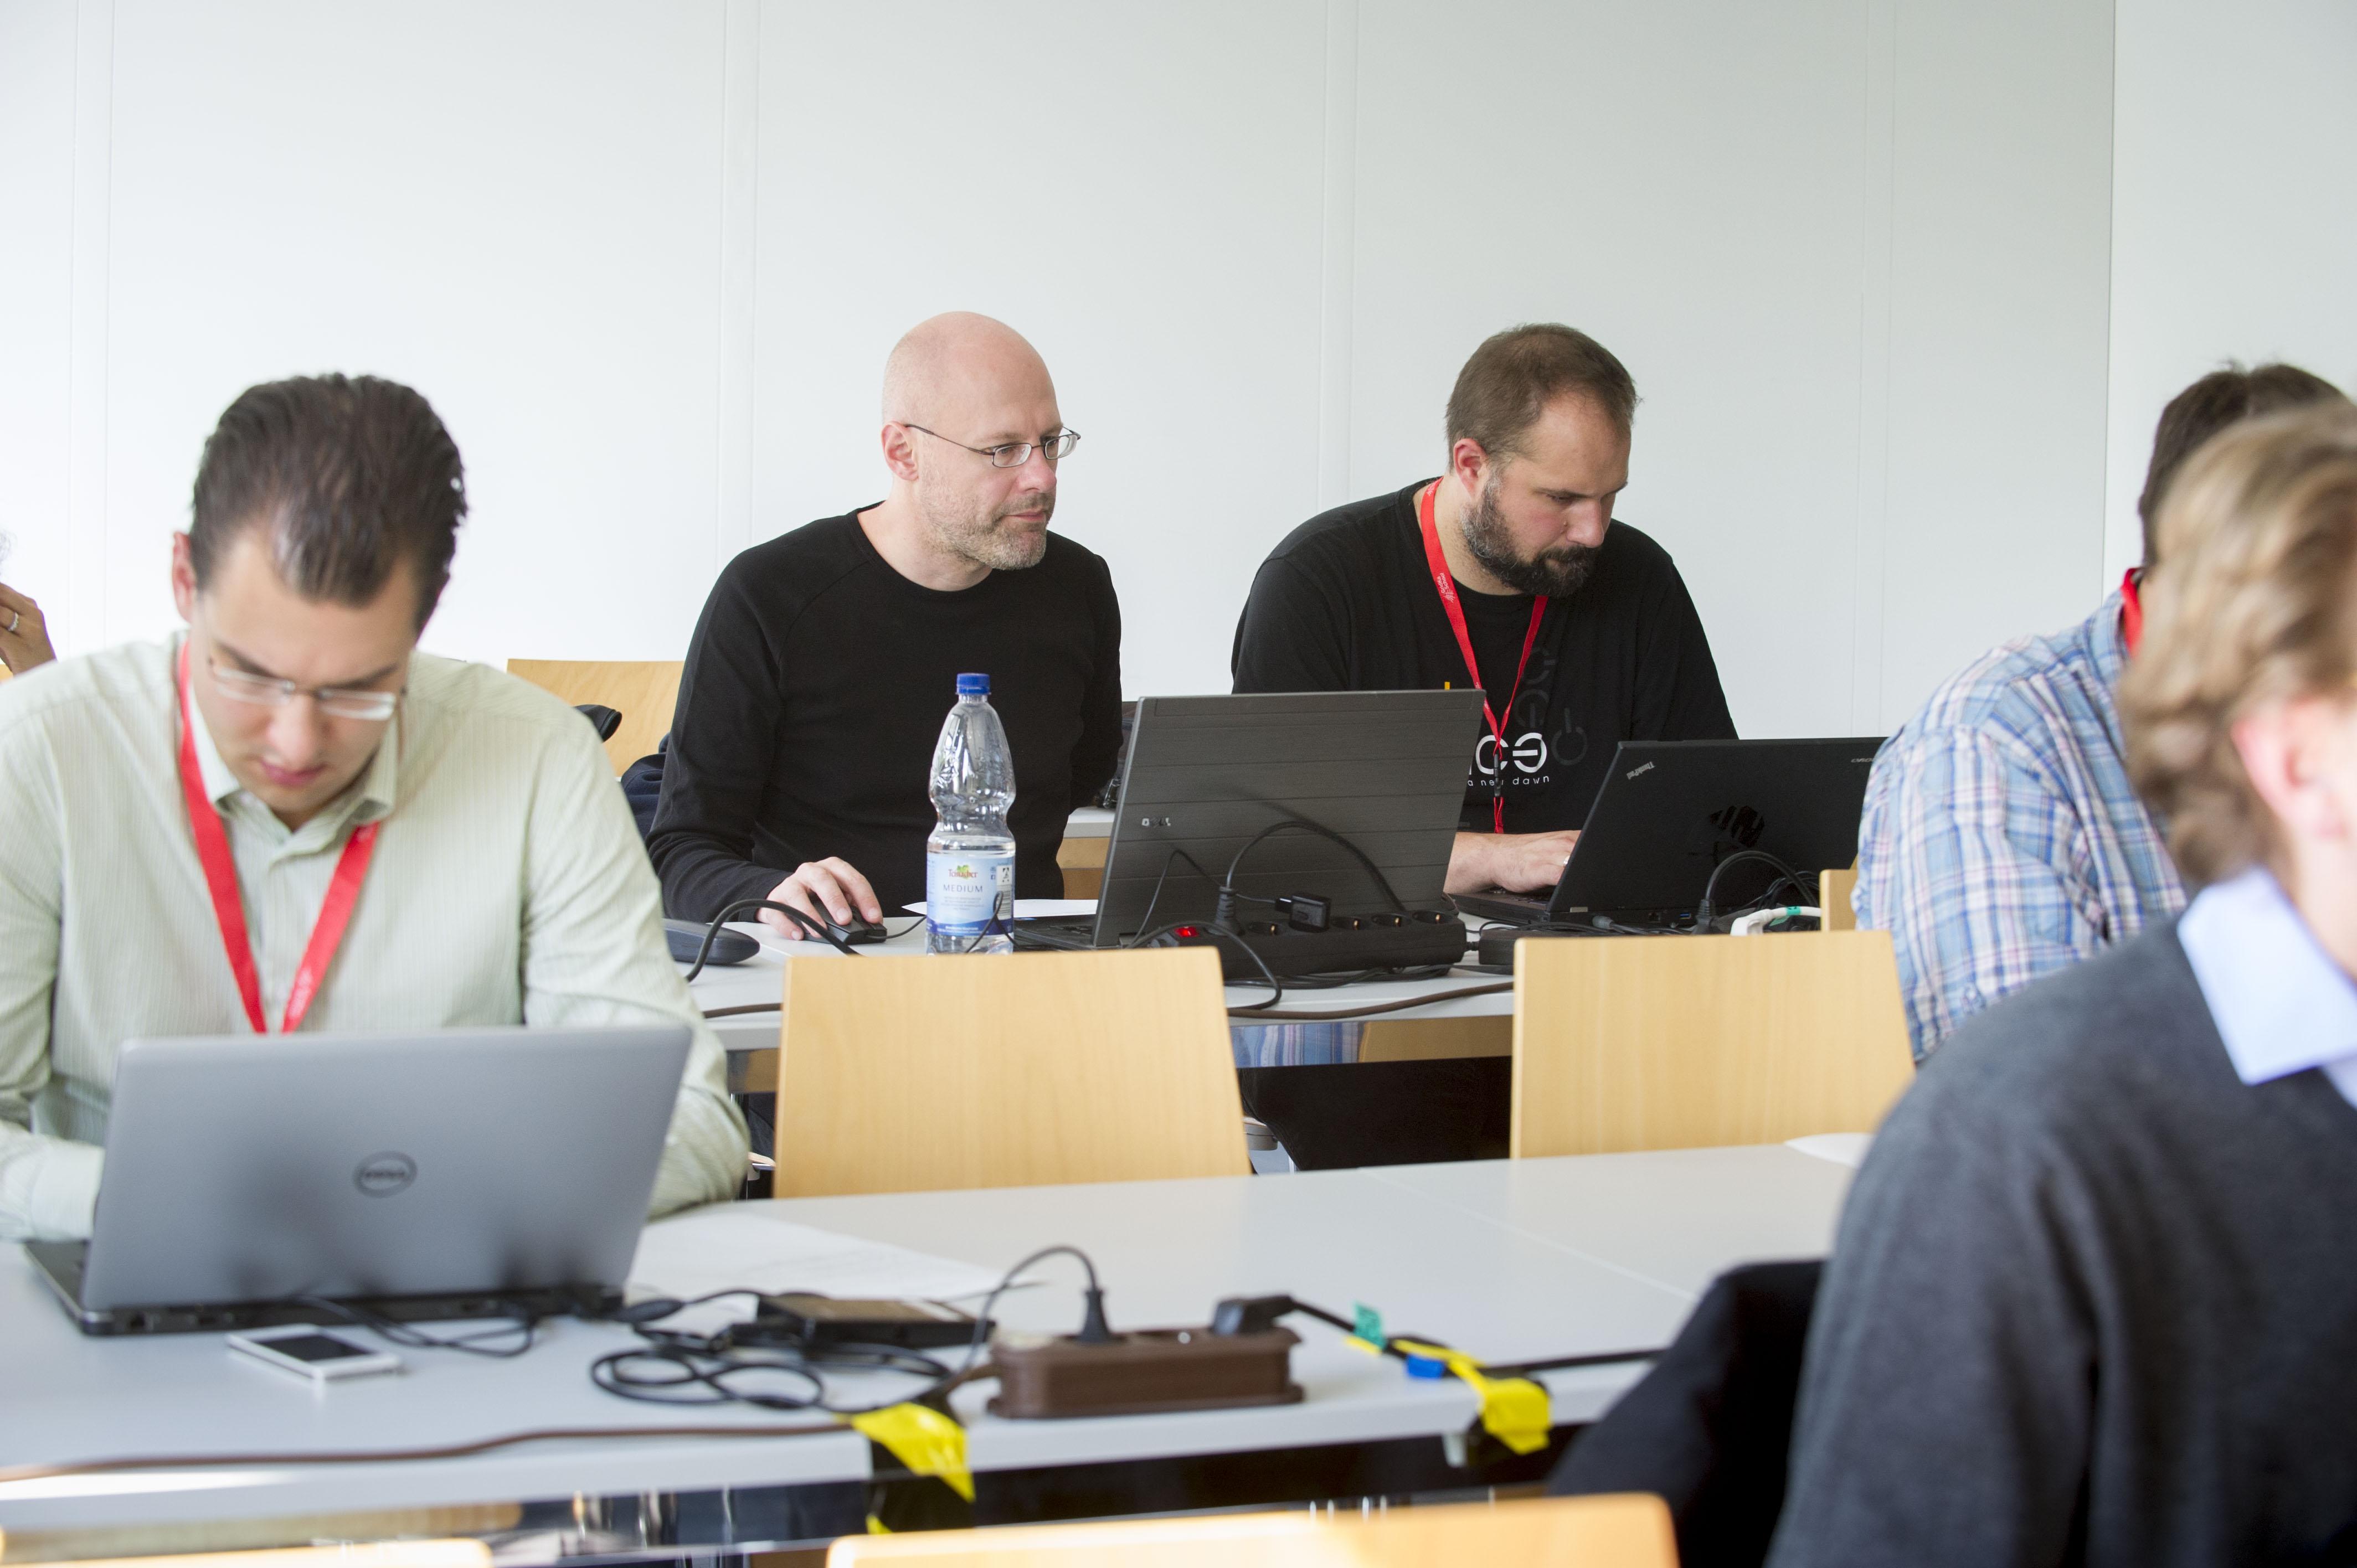 working in the GridKa School workshops (photo by Tanja Meissner, KIT)